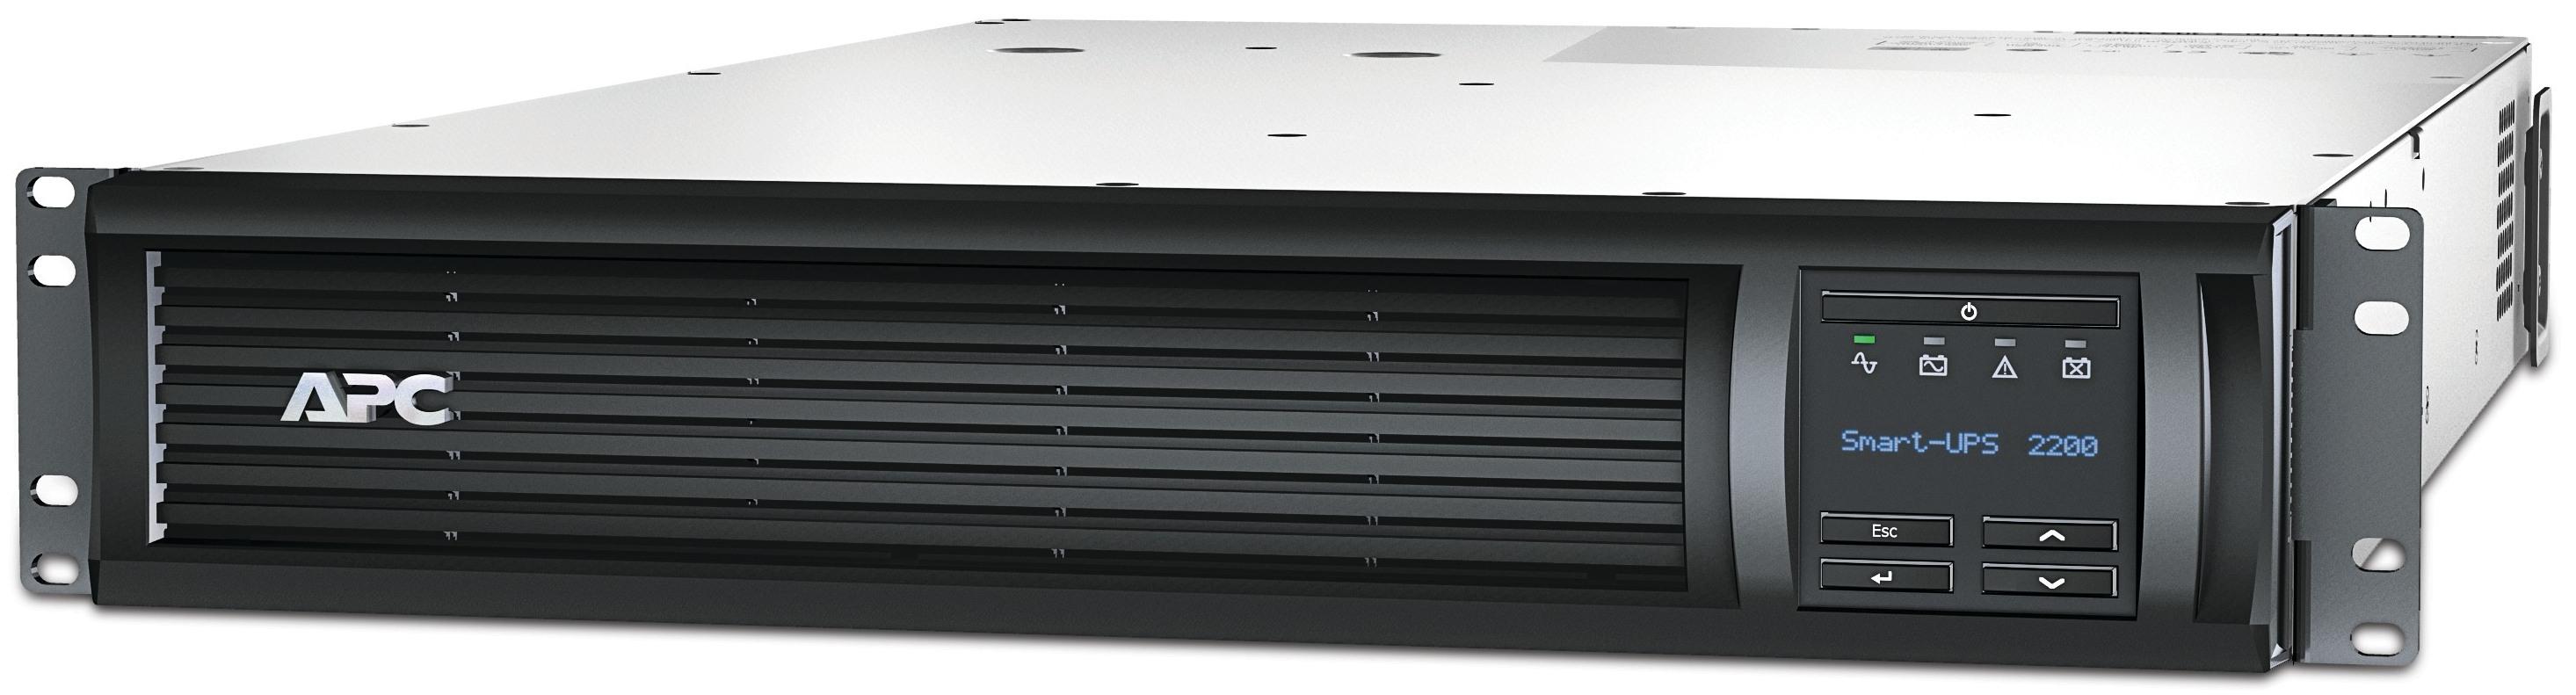 APC-by-Schneider-Electric-Smart-UPS-SMT2200RMI2UNC